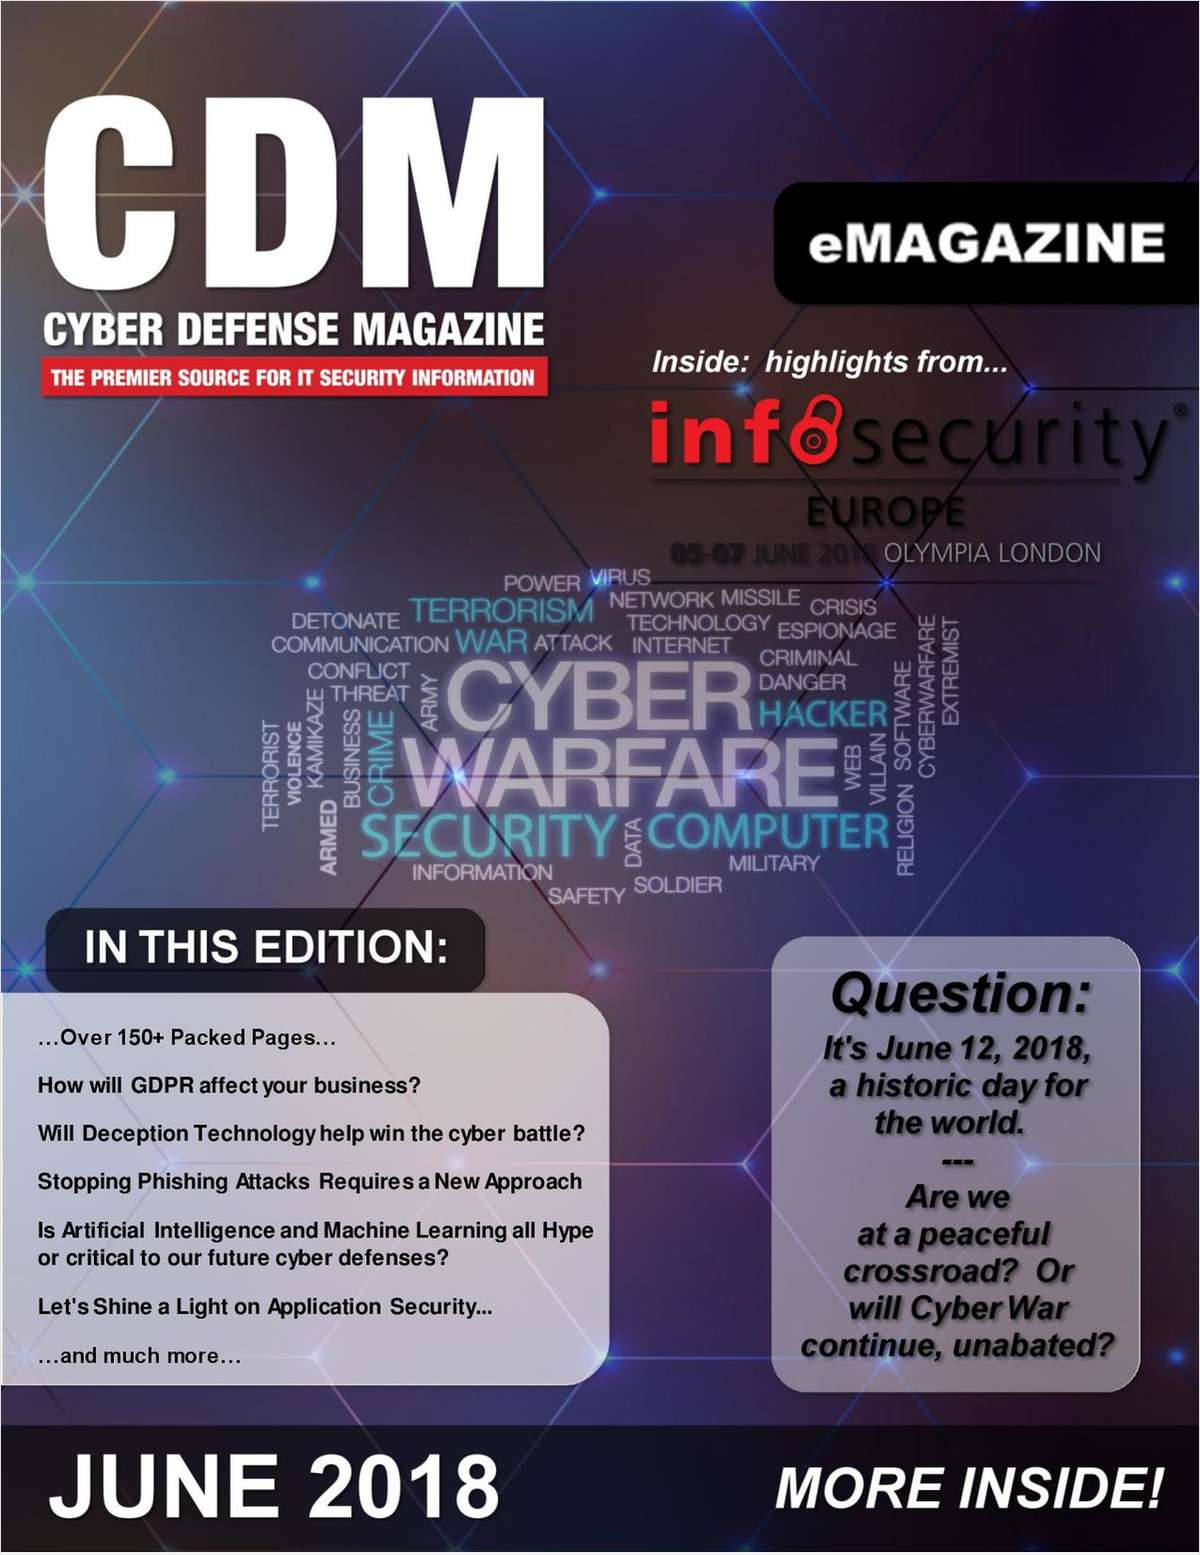 Cyber Defense Magazine - June 2018